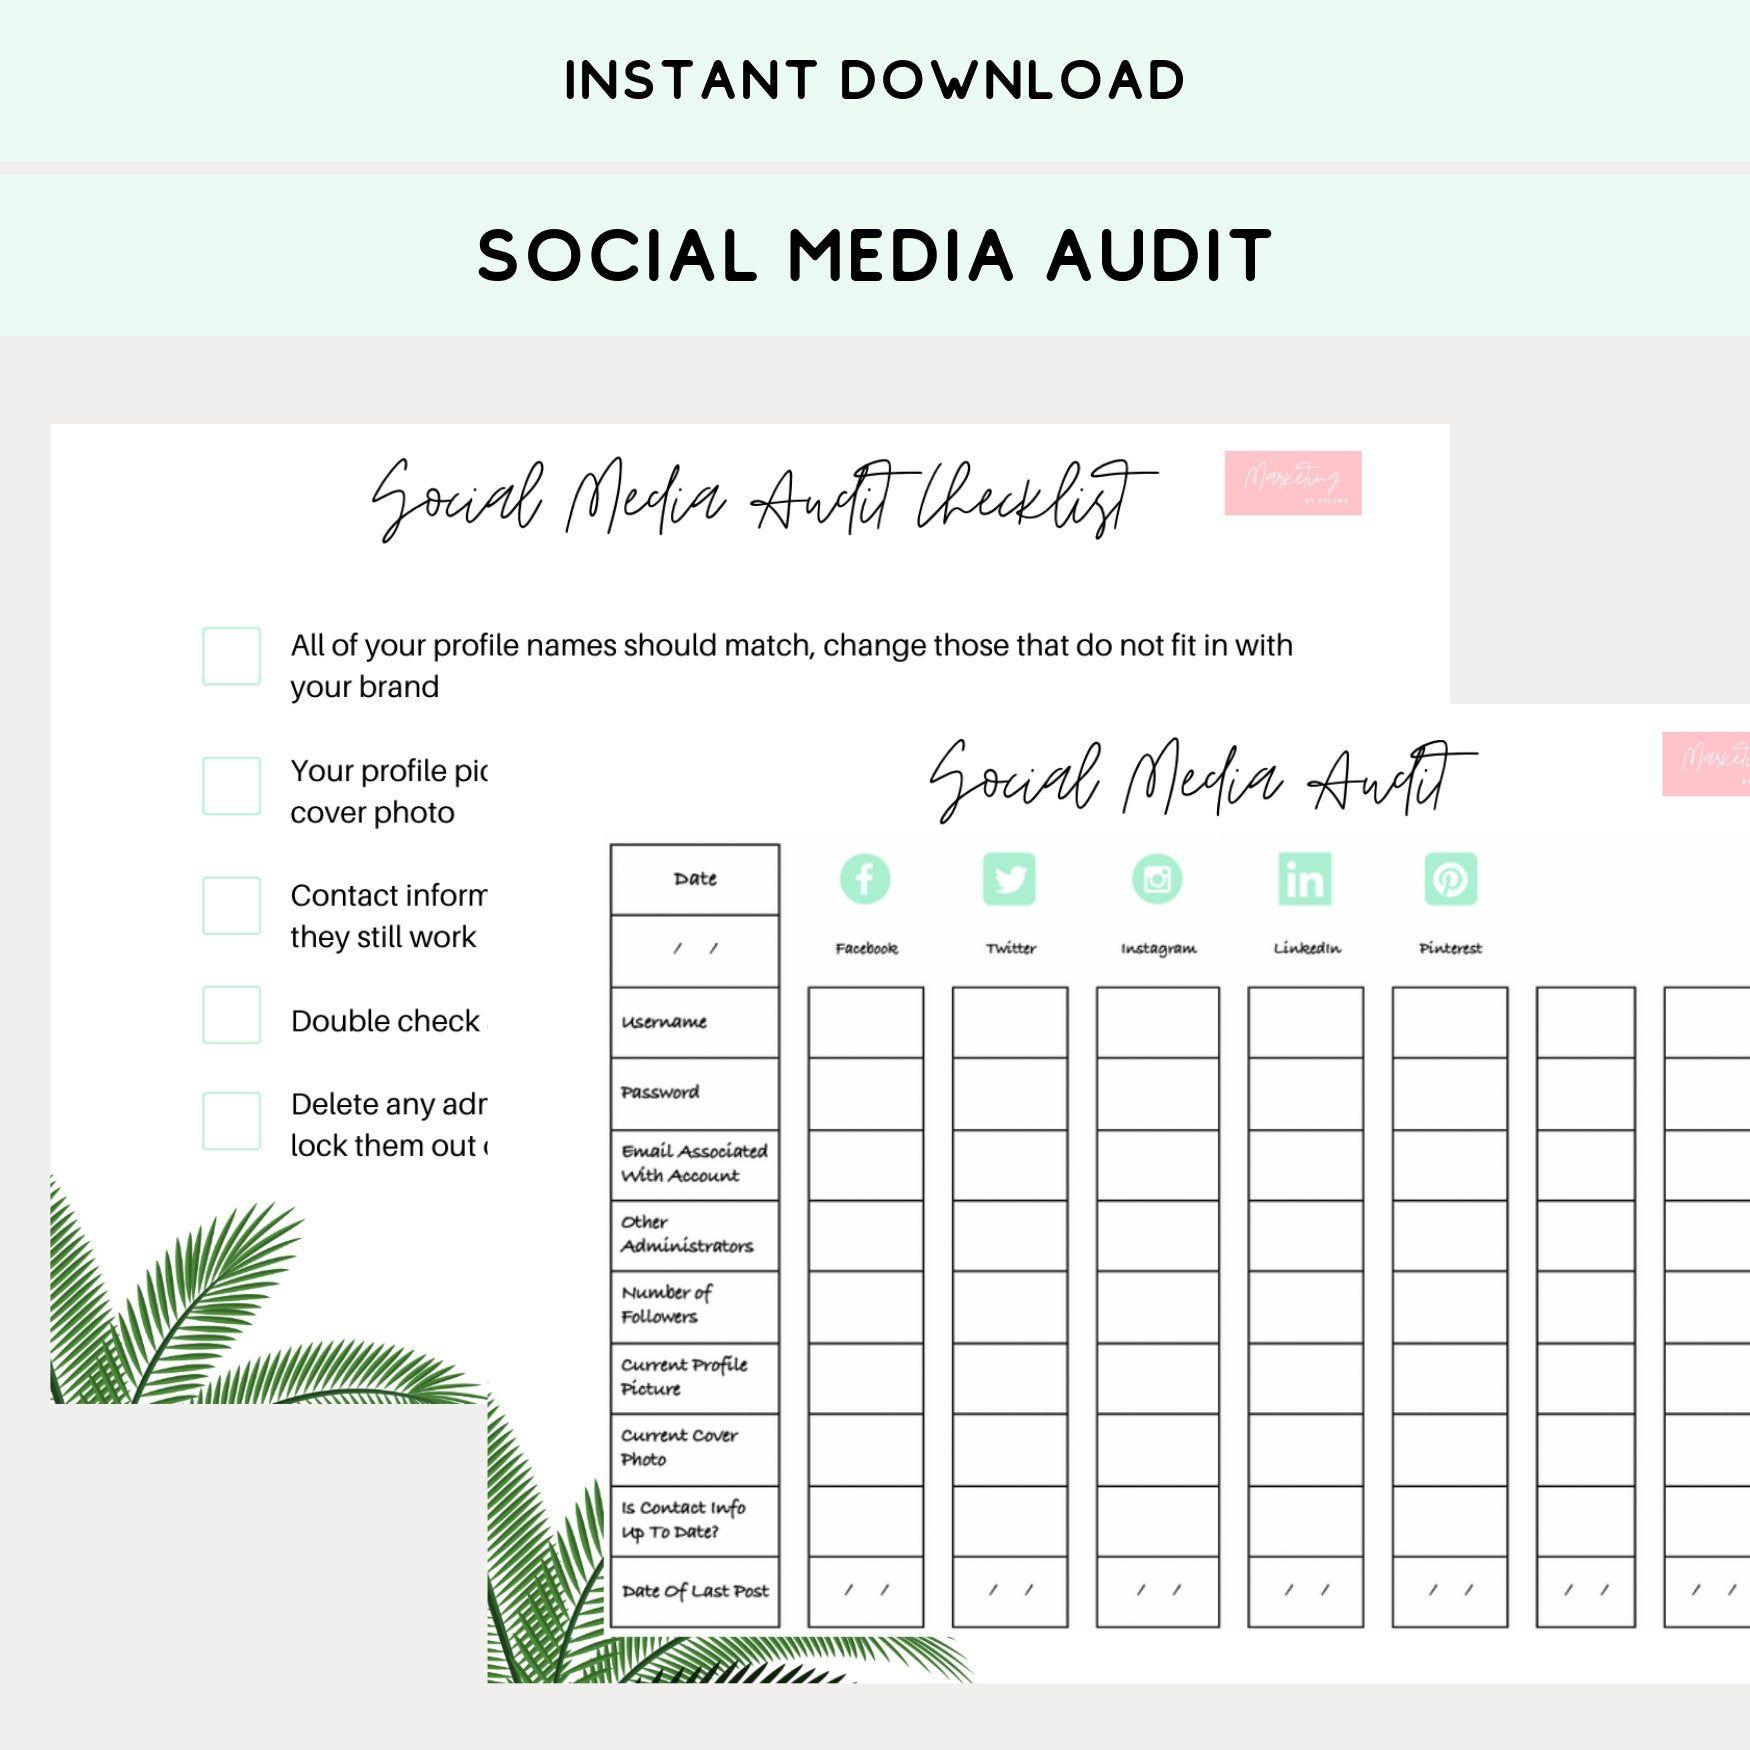 Social Media Audit Worksheet For Help With Social Media